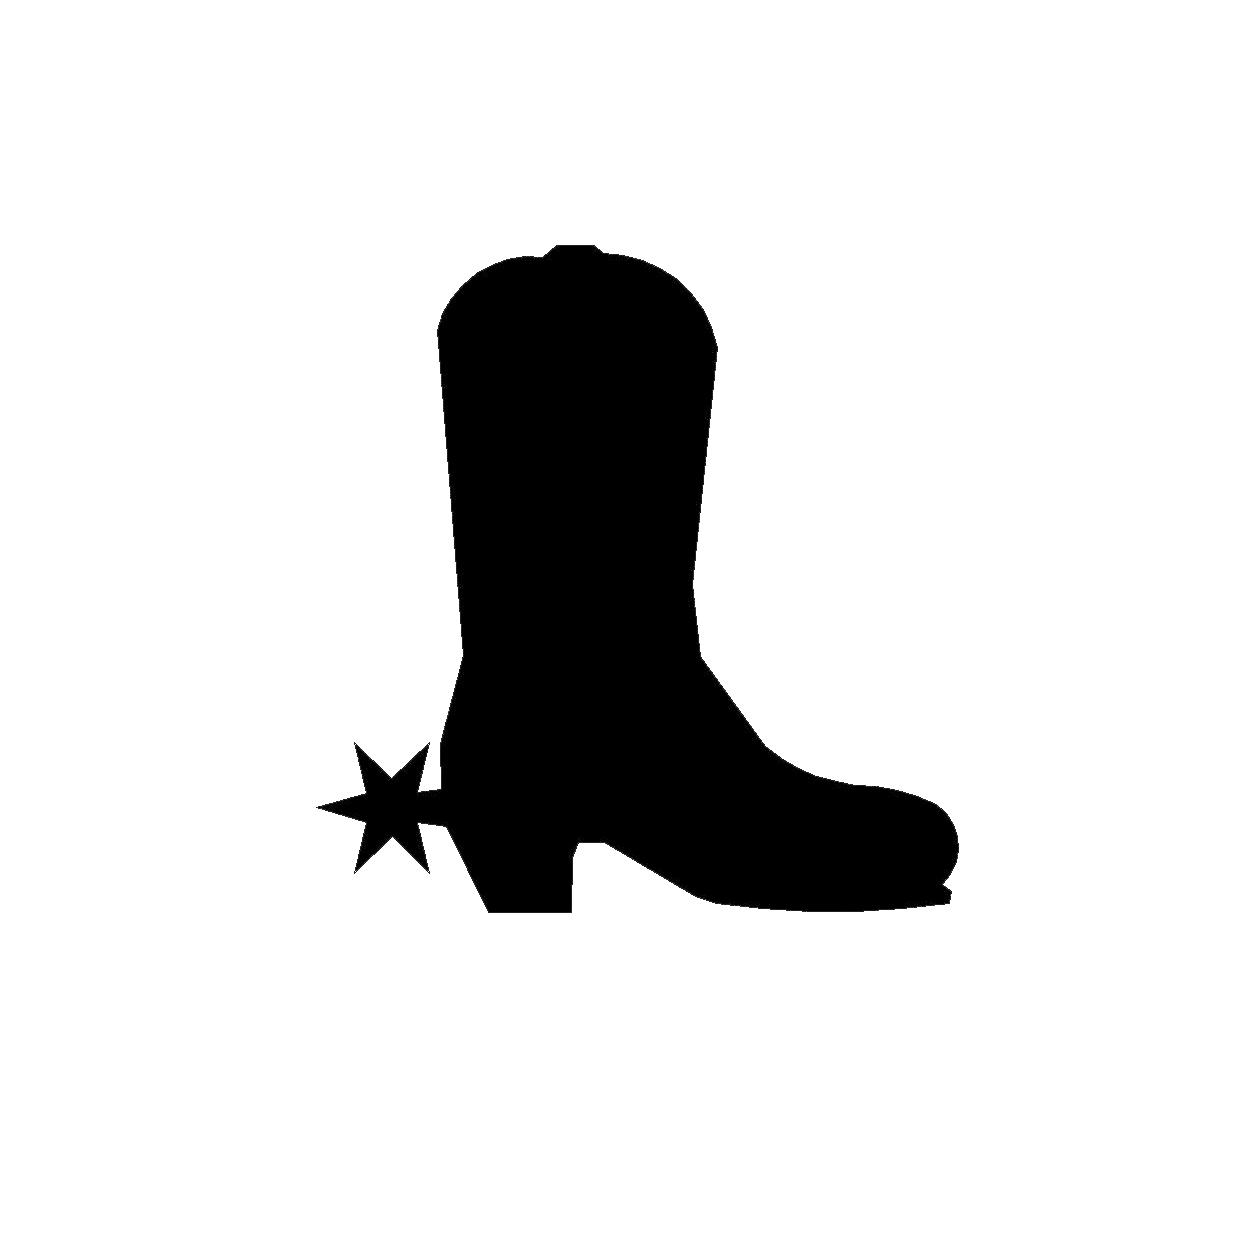 free cowboy silhouette clip art at getdrawings com free for rh getdrawings com cowboy boots pictures clip art free free clipart cowboy boots